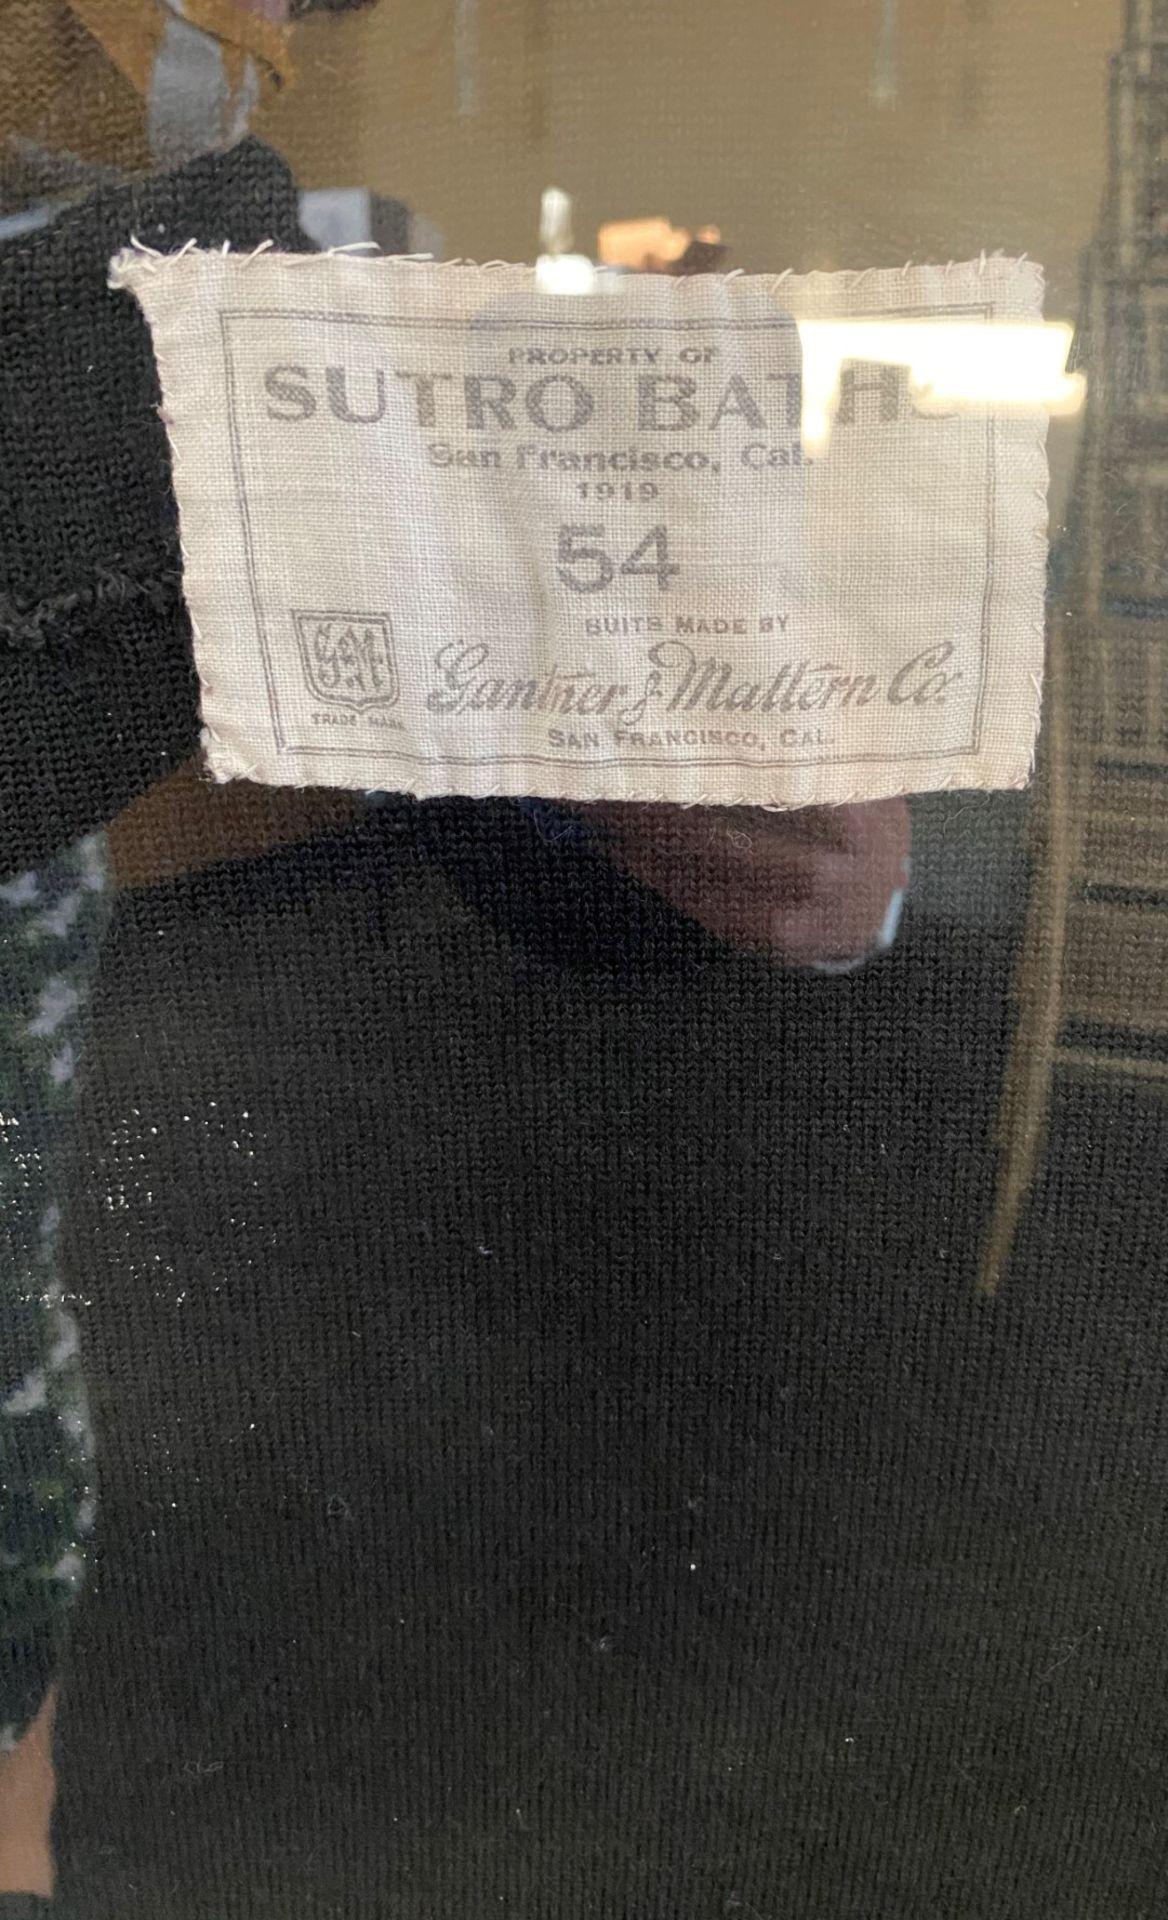 Sutro Bath Bathing Suit - Image 2 of 2